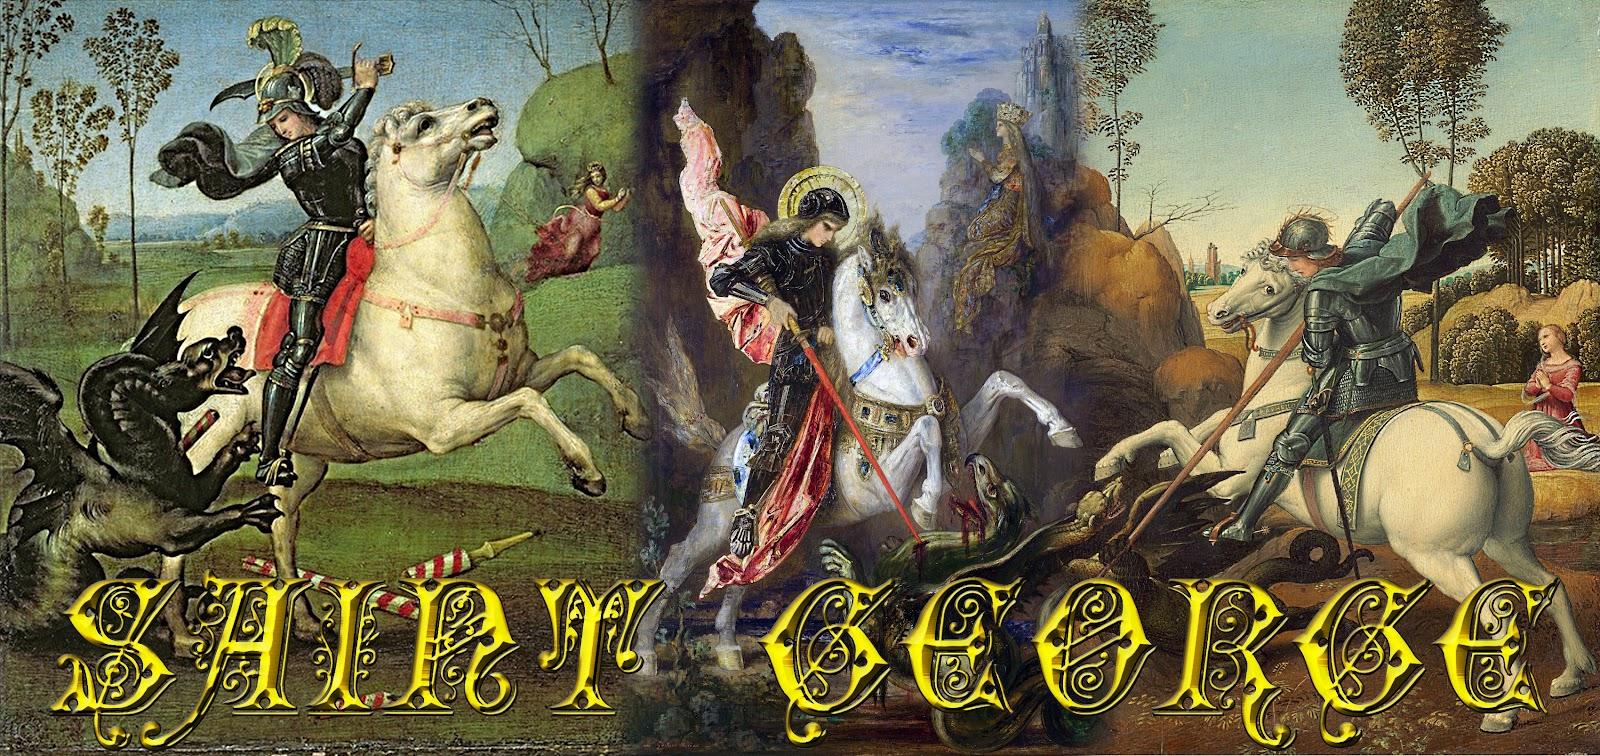 Mythological Figures: Saint George (5E) | Morrus' Unofficial